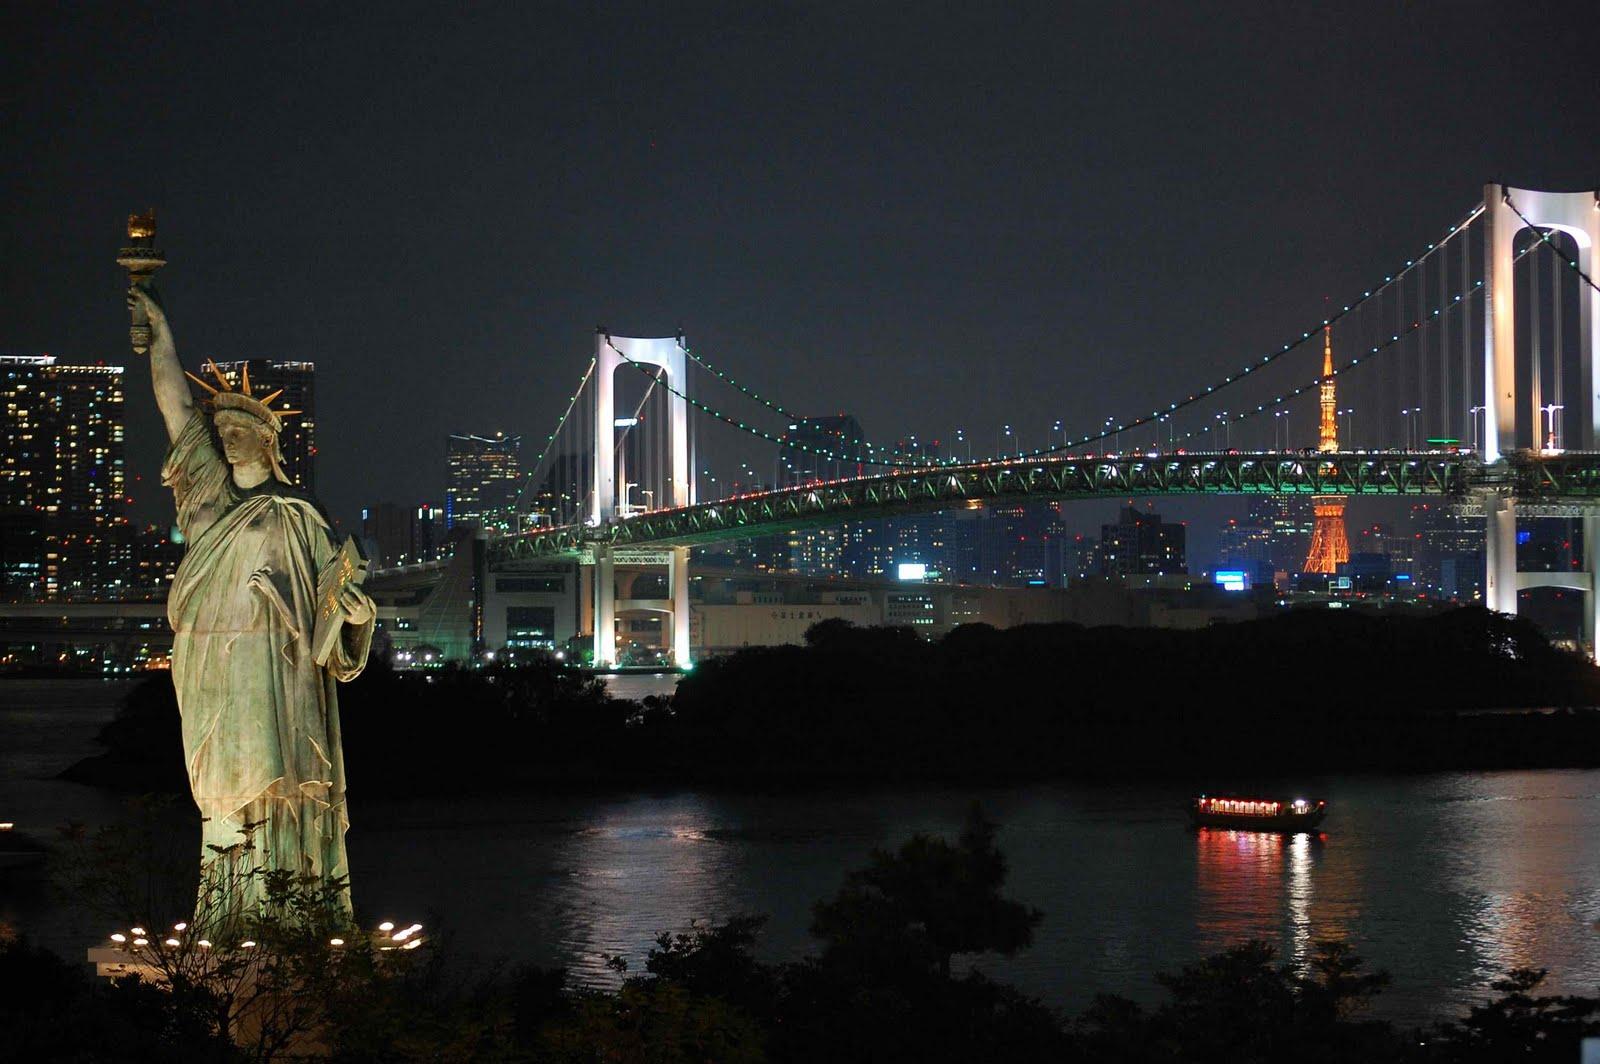 http://3.bp.blogspot.com/-pPvhRy16bTE/TVfNaIvJzeI/AAAAAAAABJI/XIi9HZzly7k/s1600/Odaiba.jpg